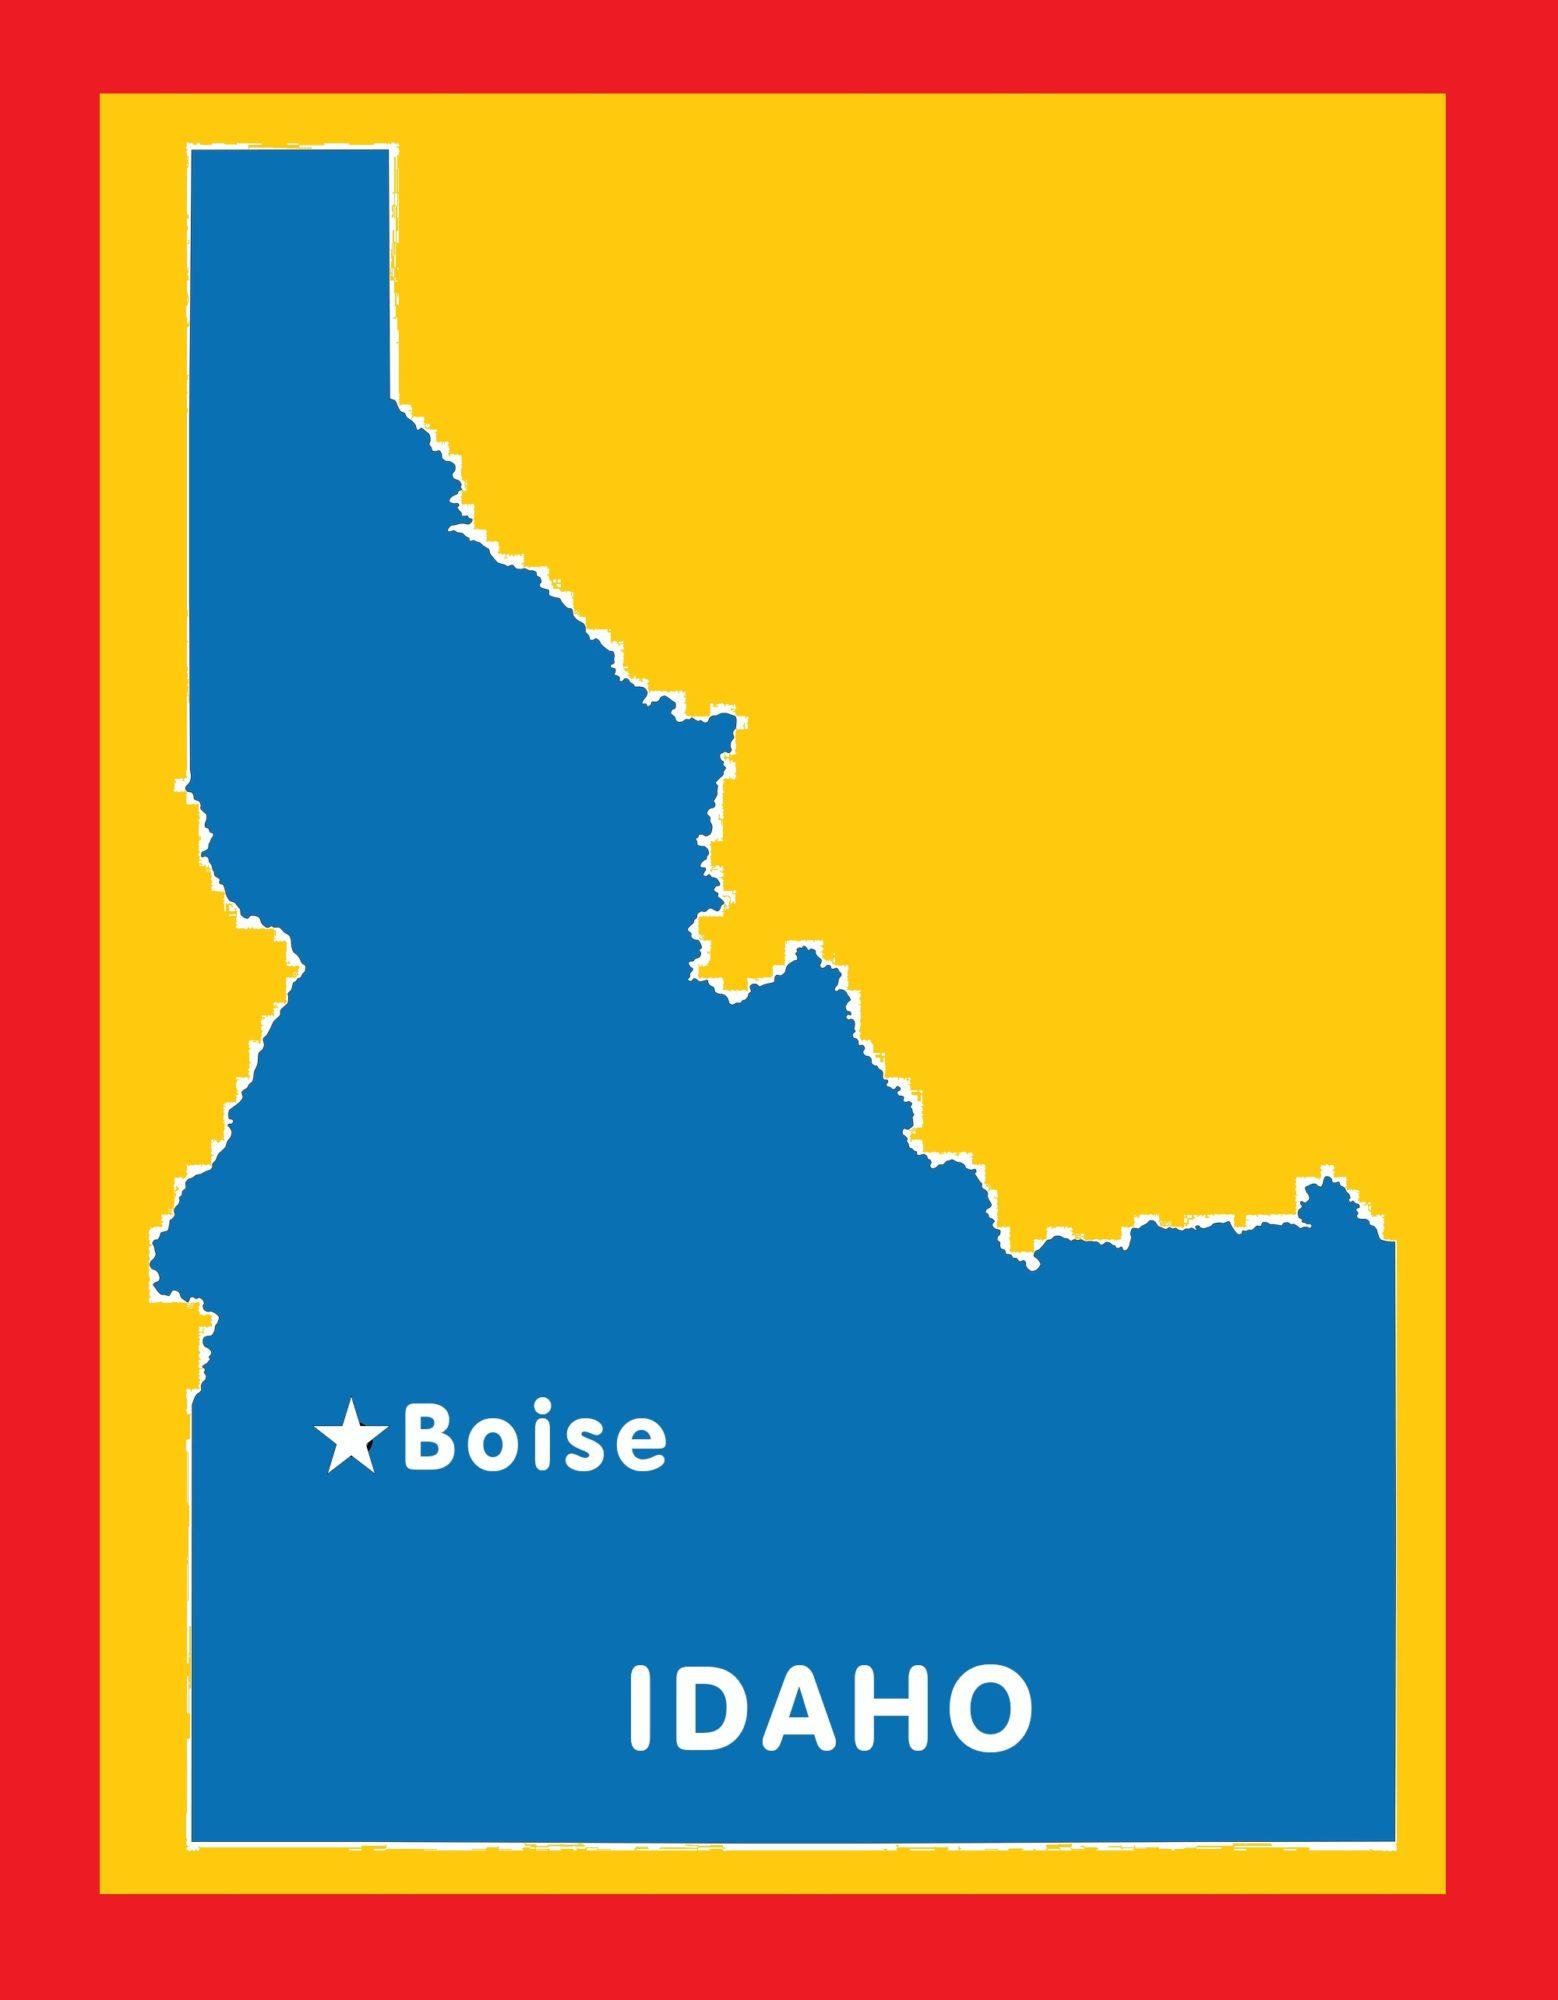 Idaho Capital Map | Large Printable and Standard Map 6